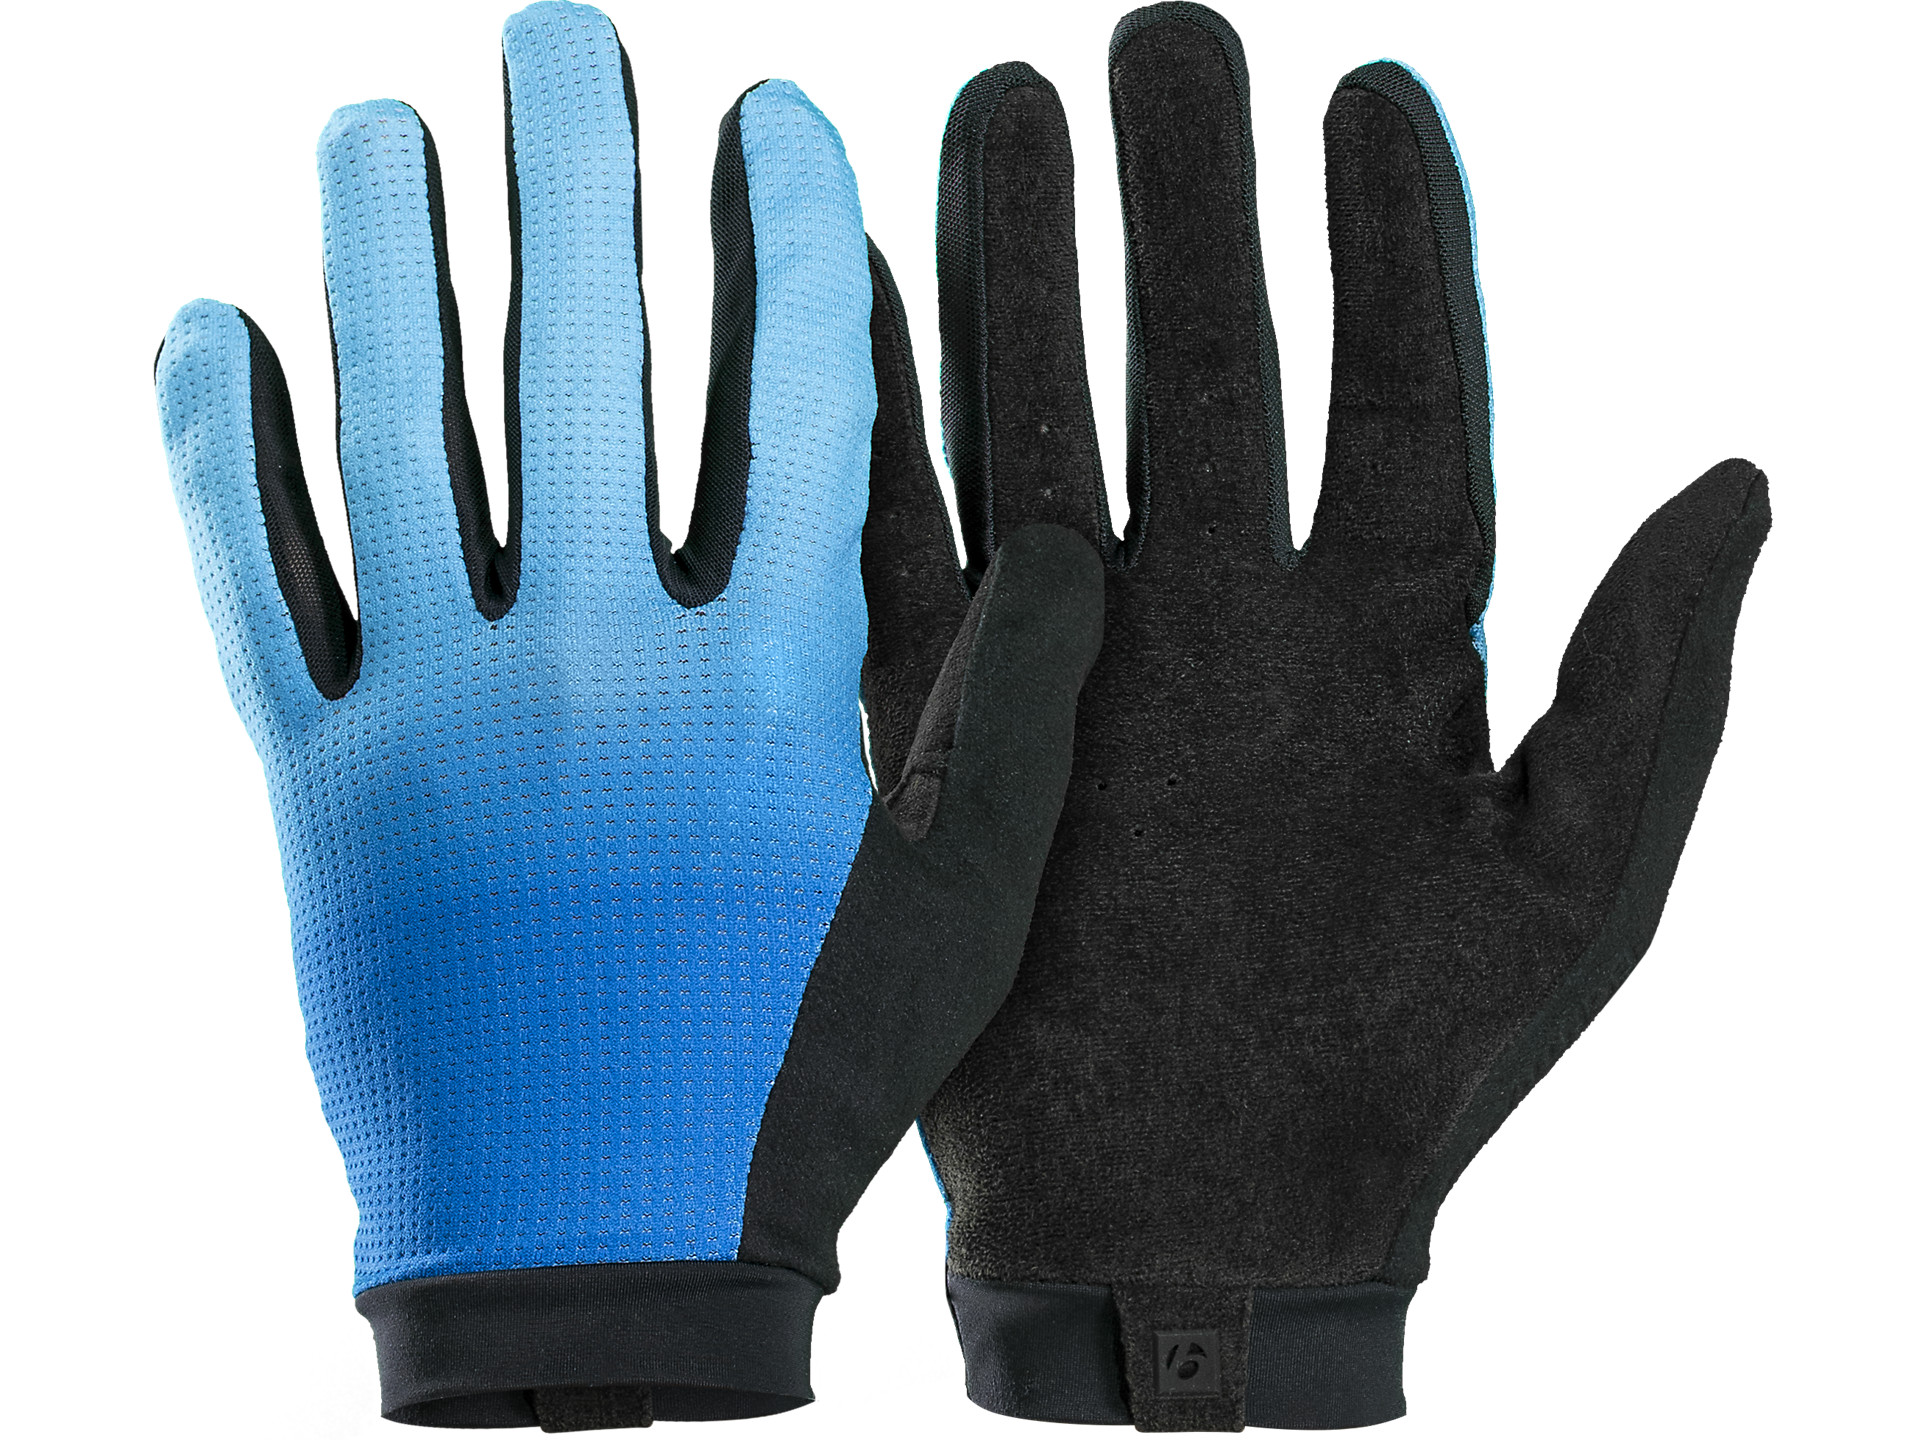 Cycling gloves | Trek Bikes